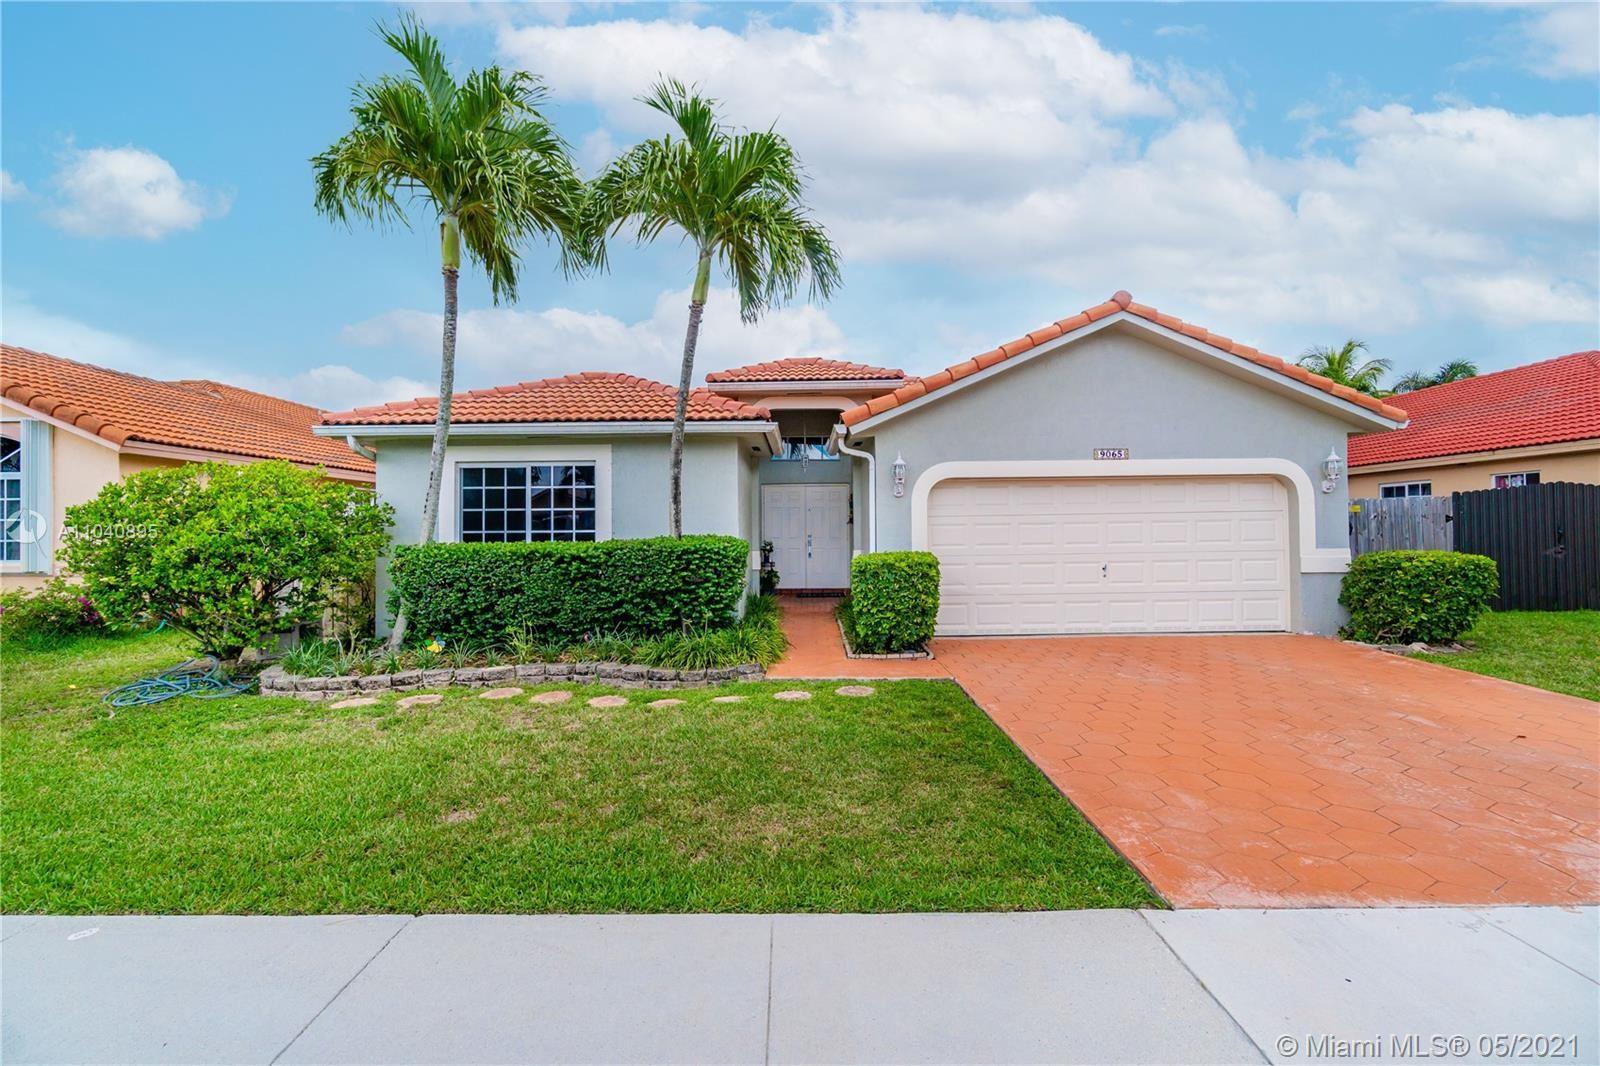 Photo of 9065 SW 165th Pl, Miami, FL 33196 (MLS # A11040895)